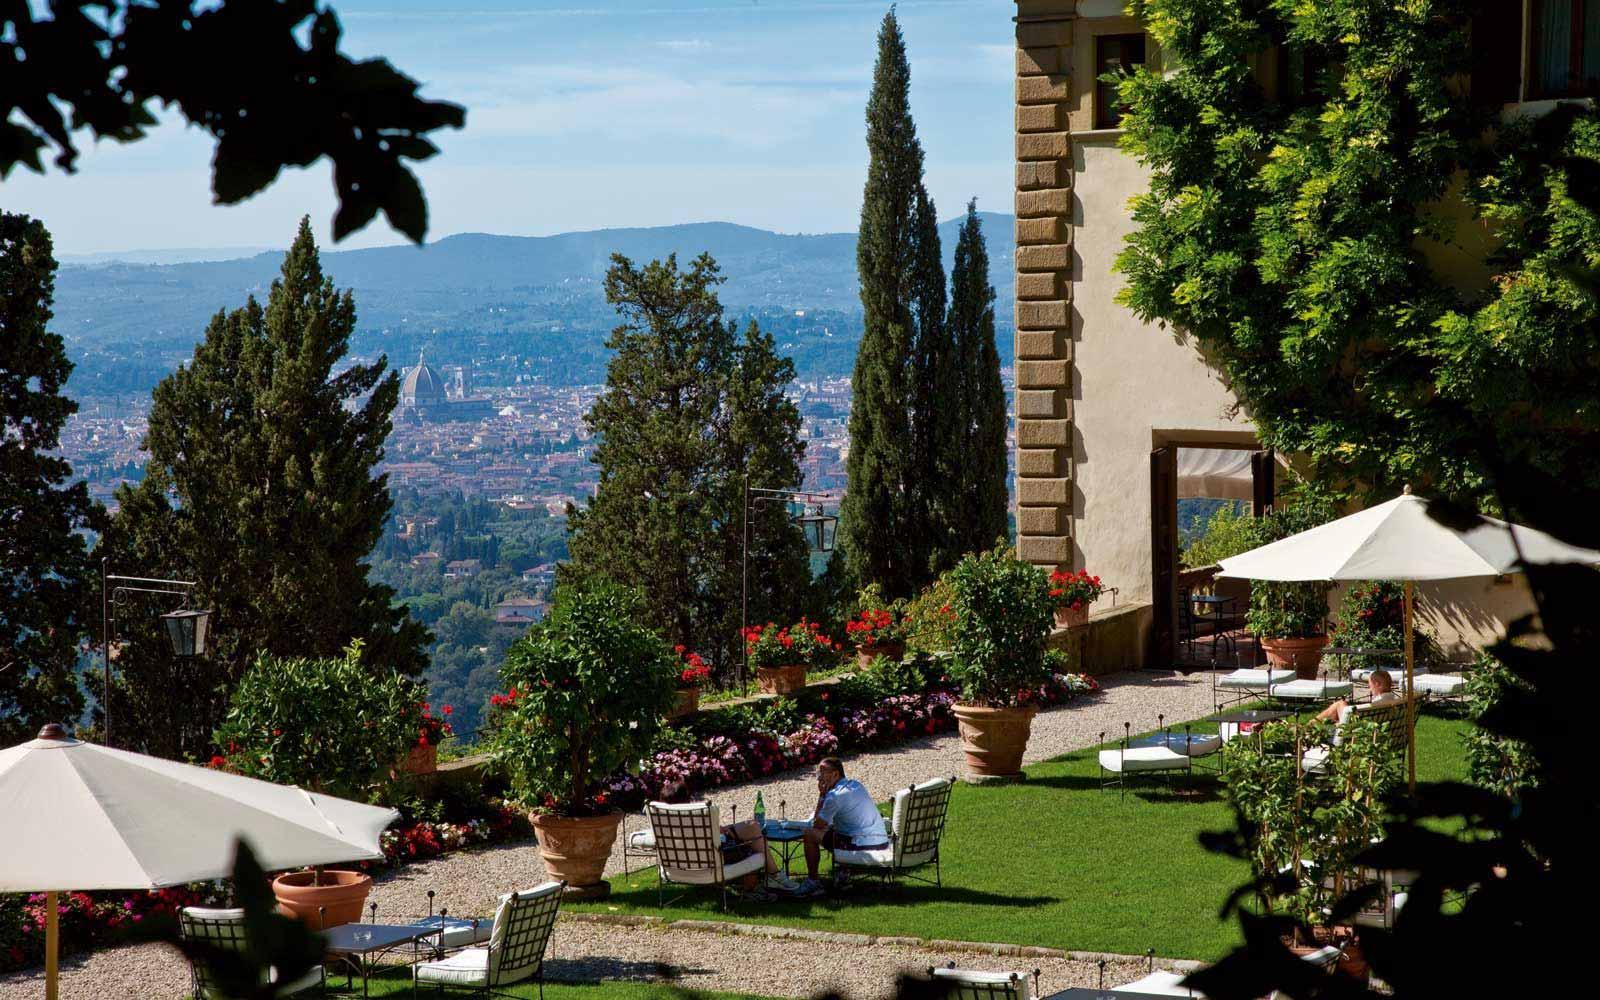 View from the Belmond Villa San Michele